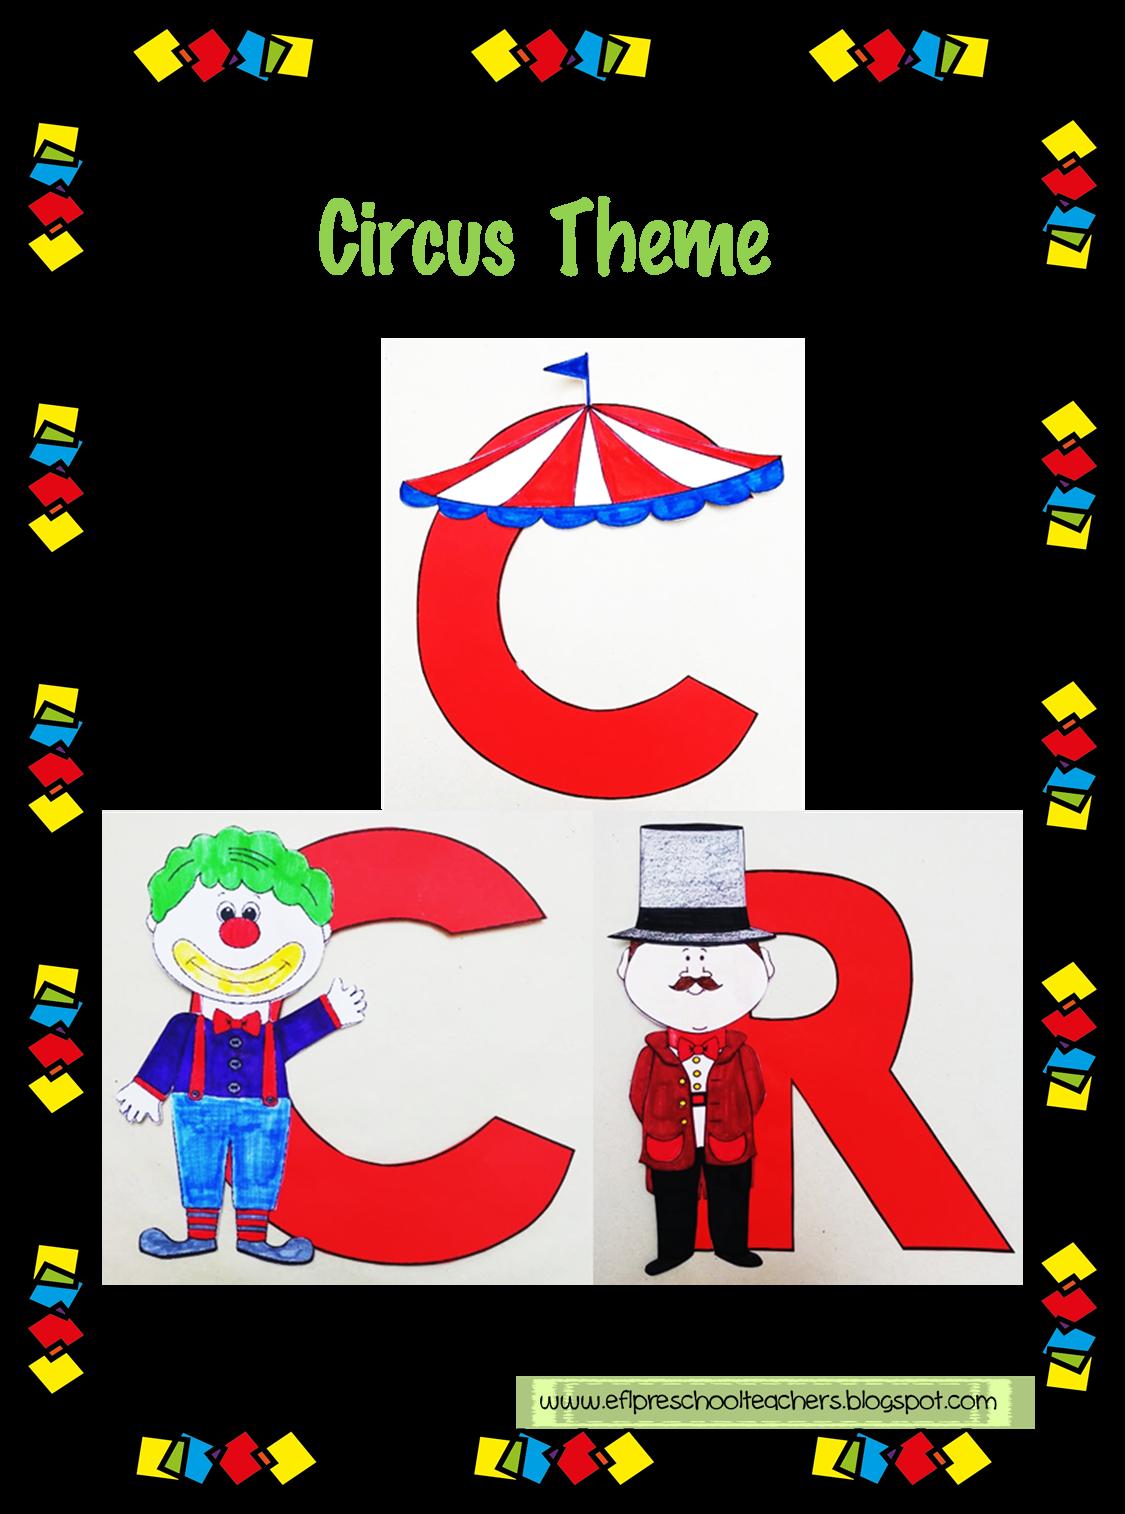 Esl Efl Preschool Teachers Circus Theme For Ell